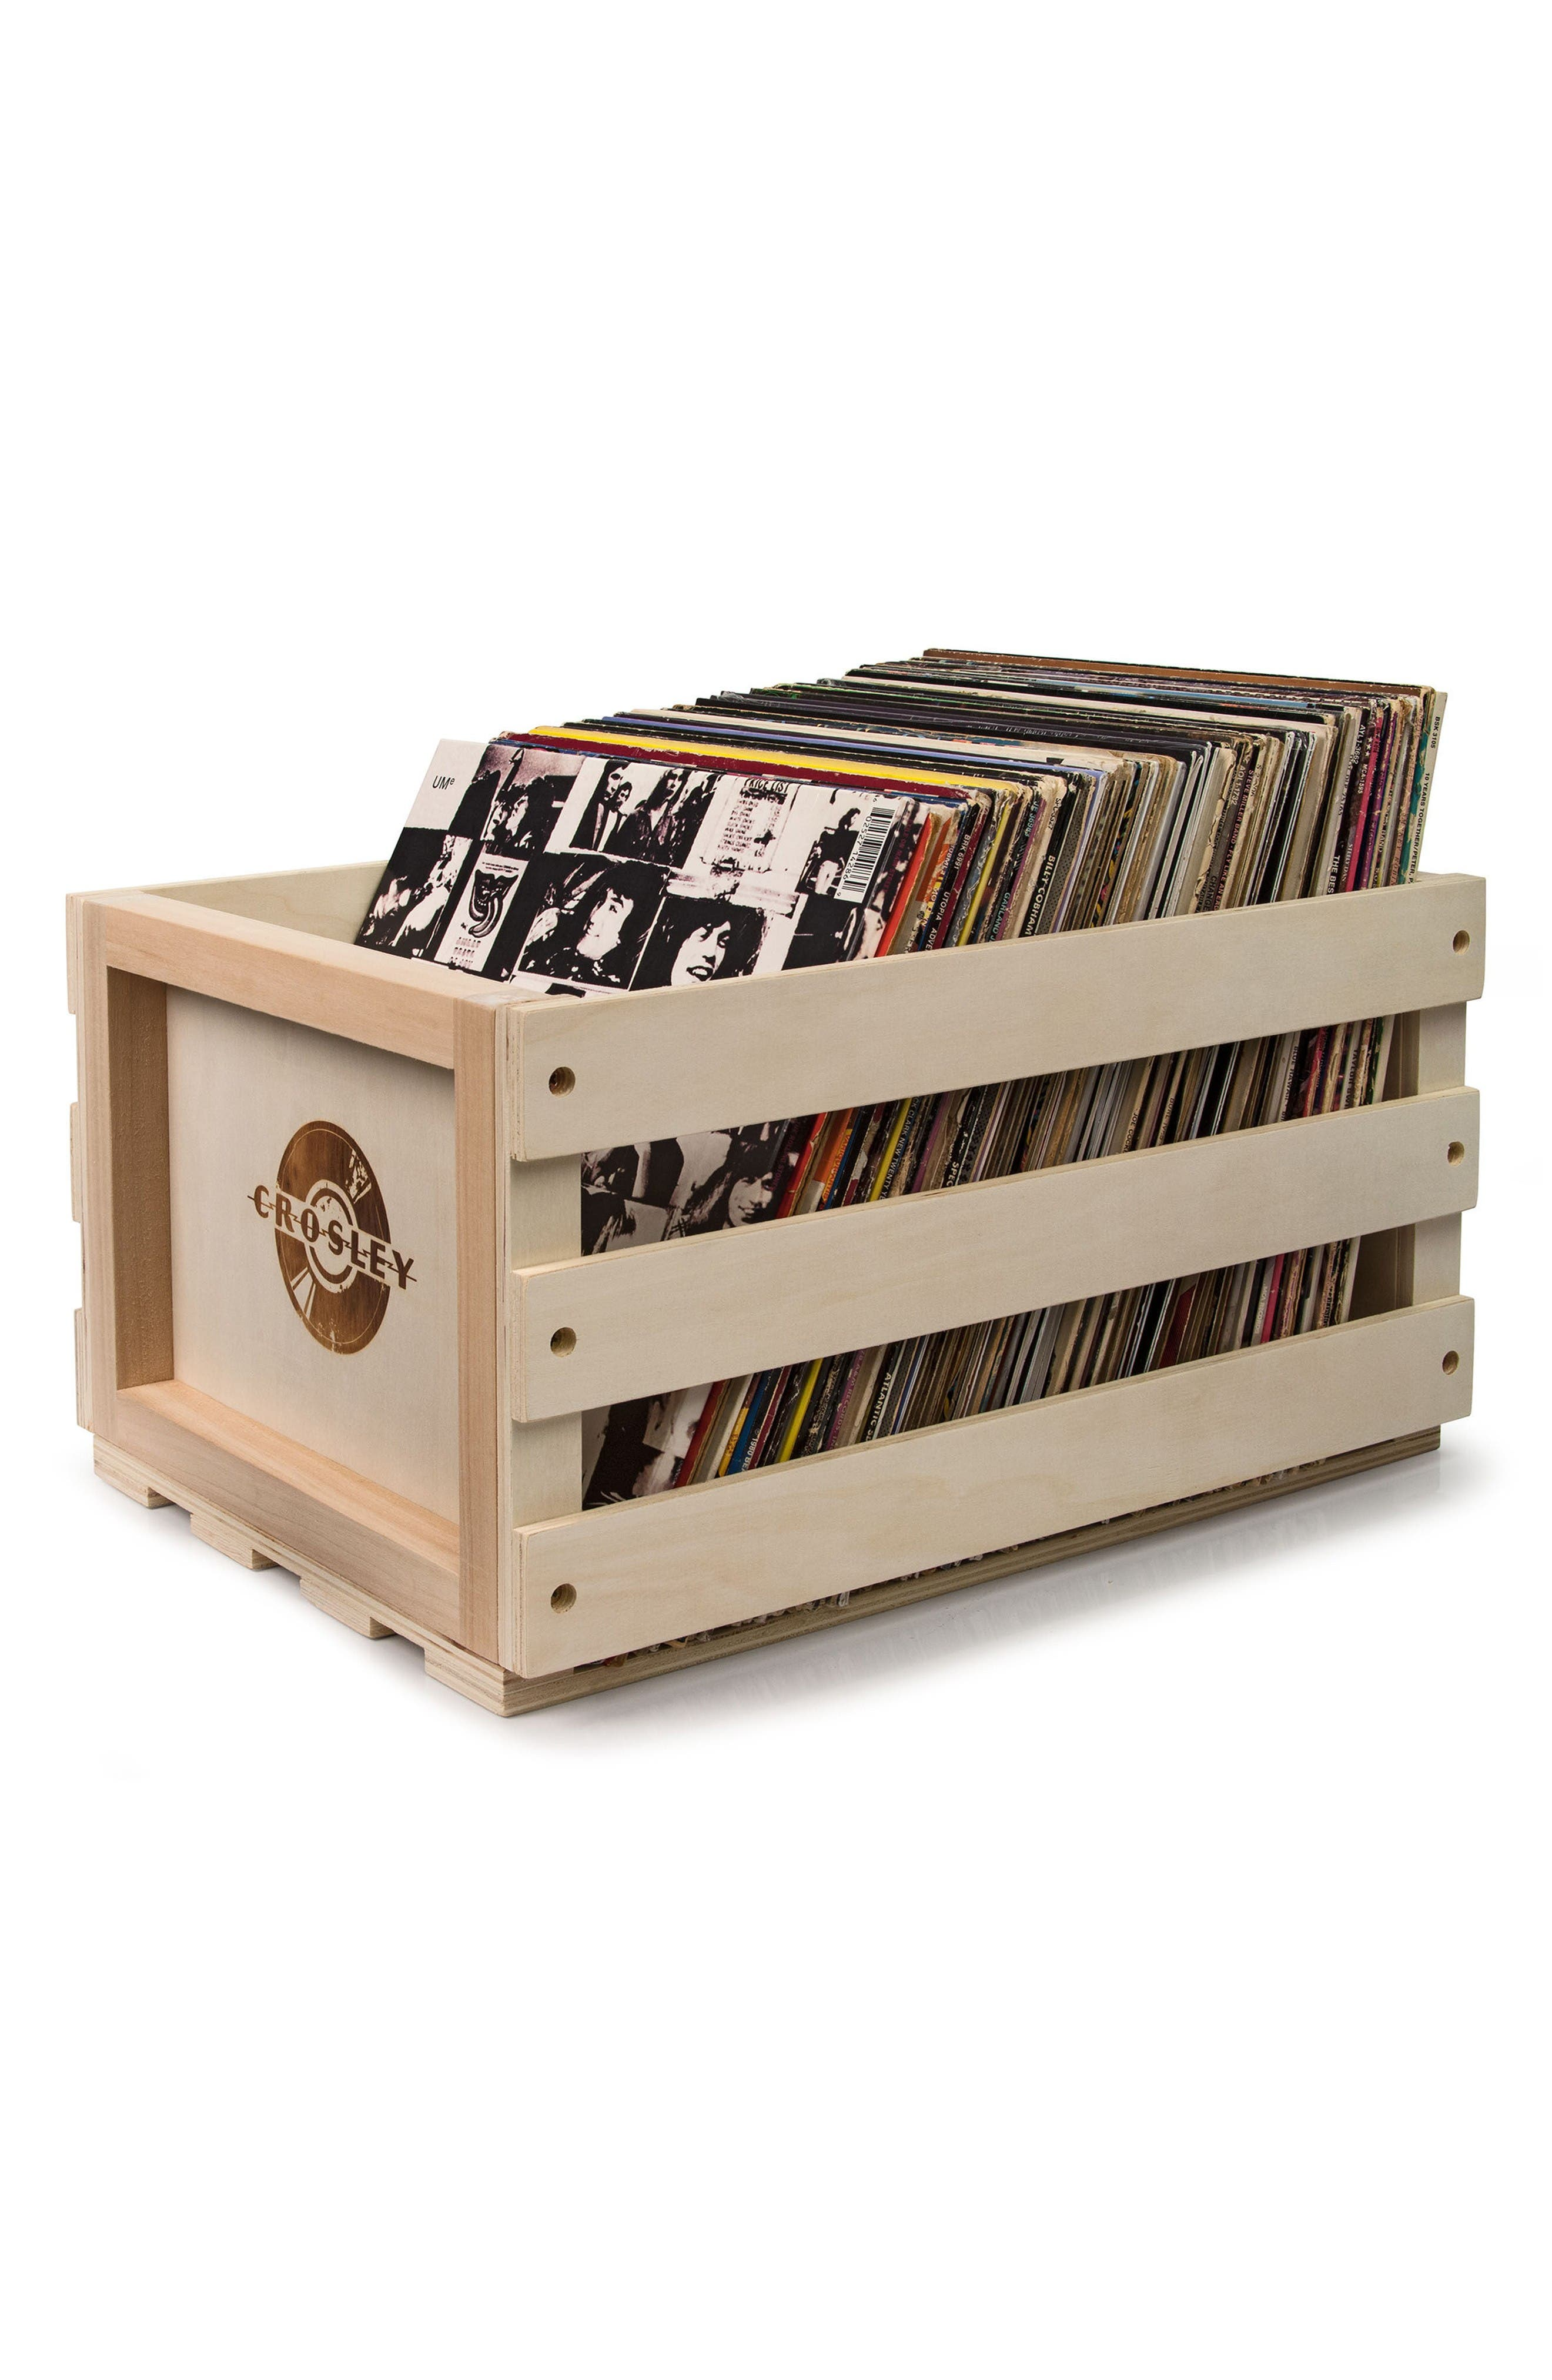 Alternate Image 1 Selected - Crosley Radio Record Storage Crate